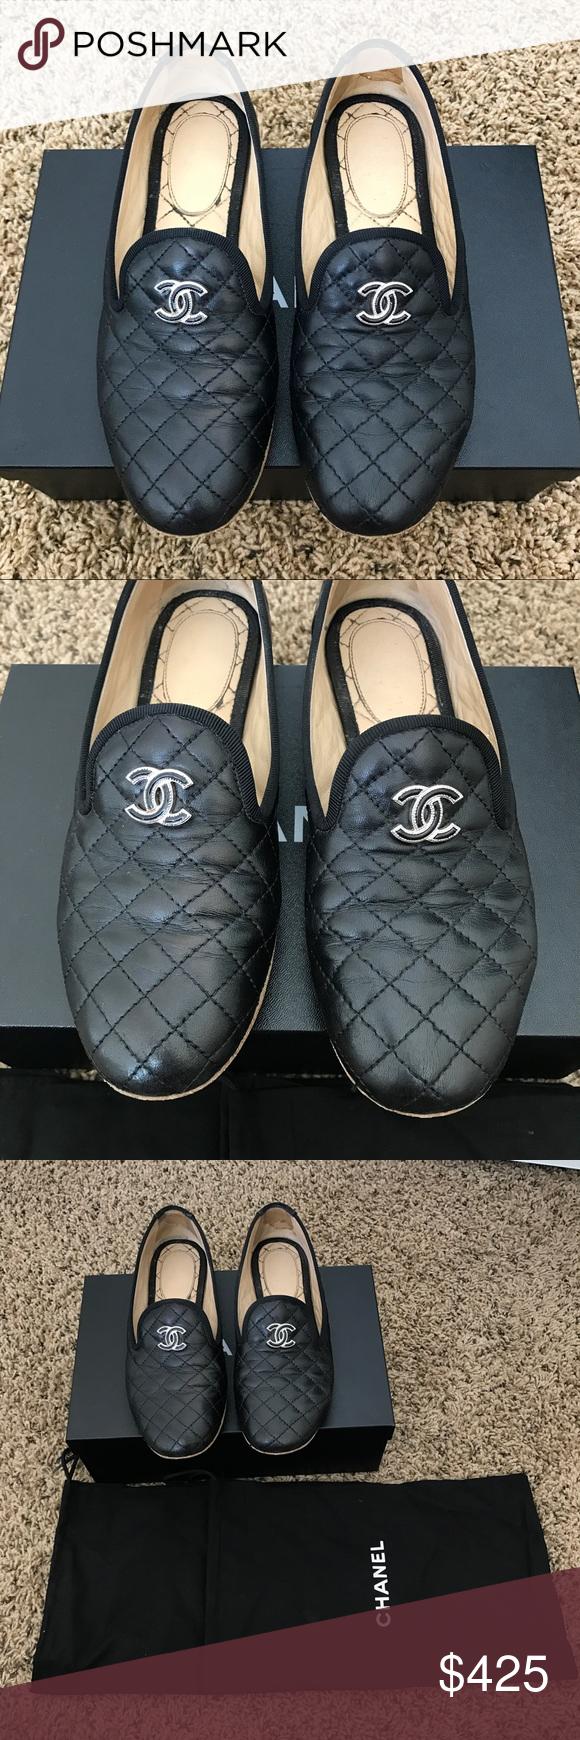 Chanel shoes flats